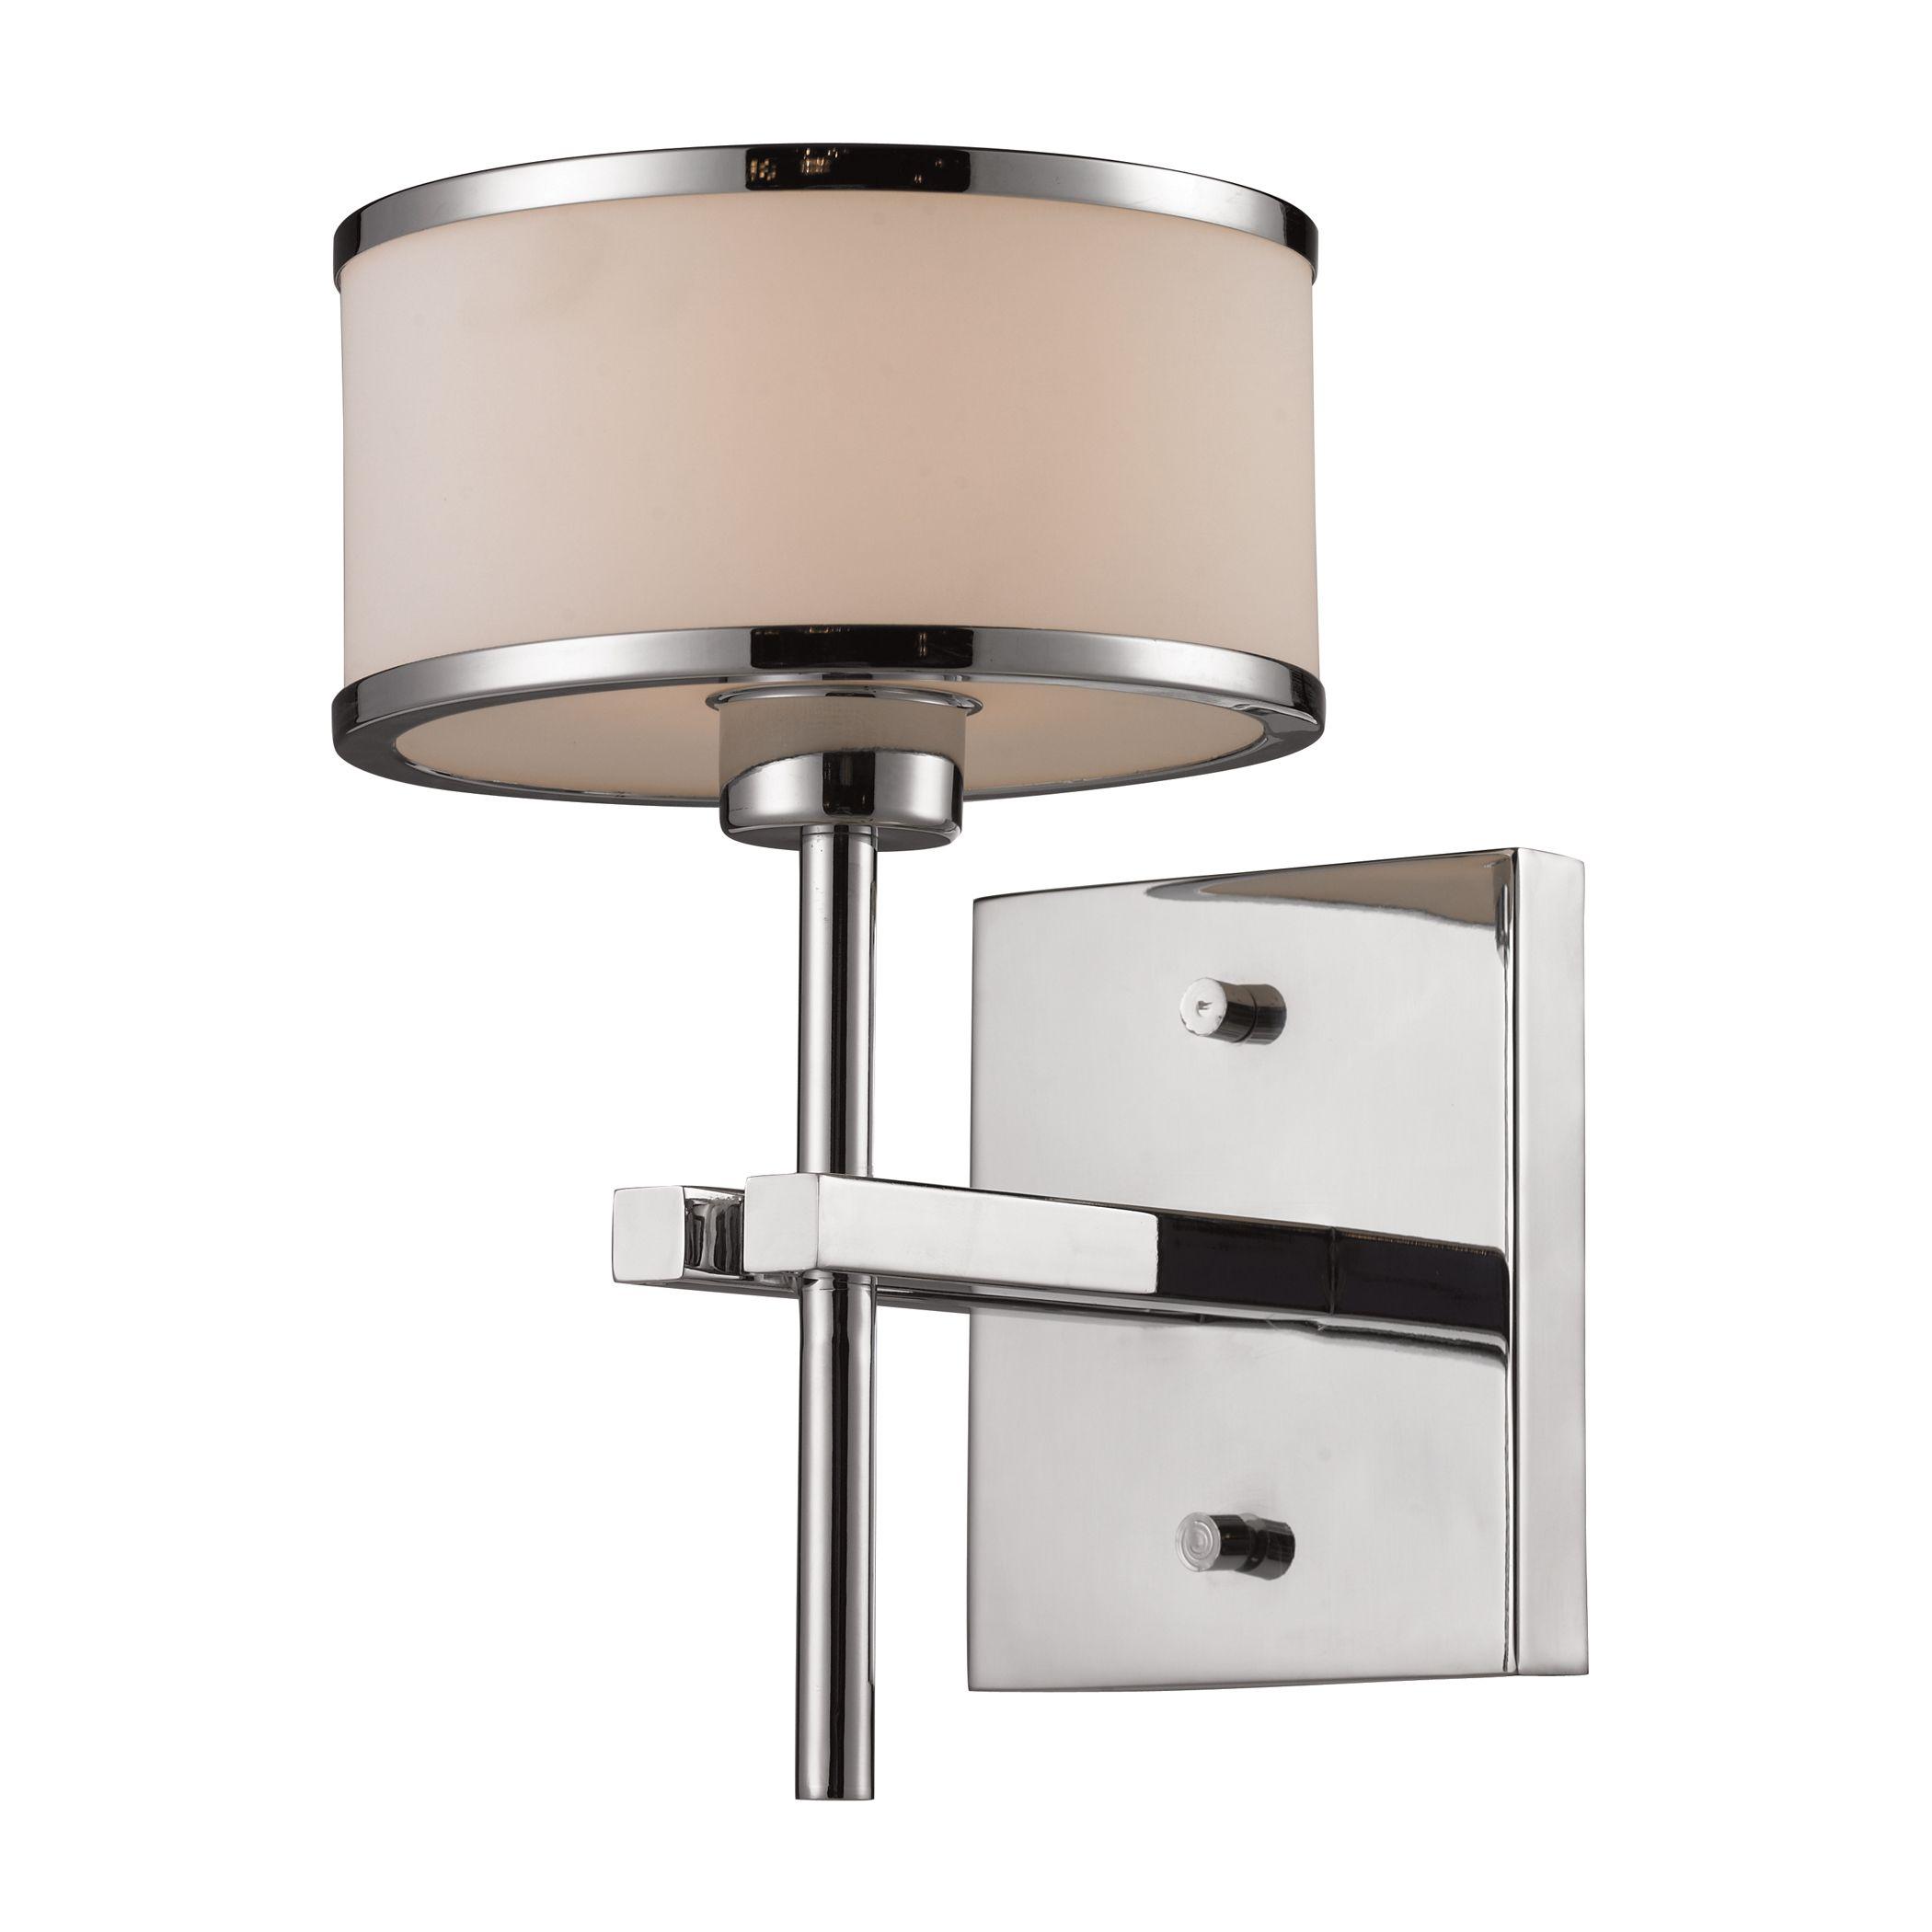 Sleek and modern bathroom light Bathroom Lighting Pinterest